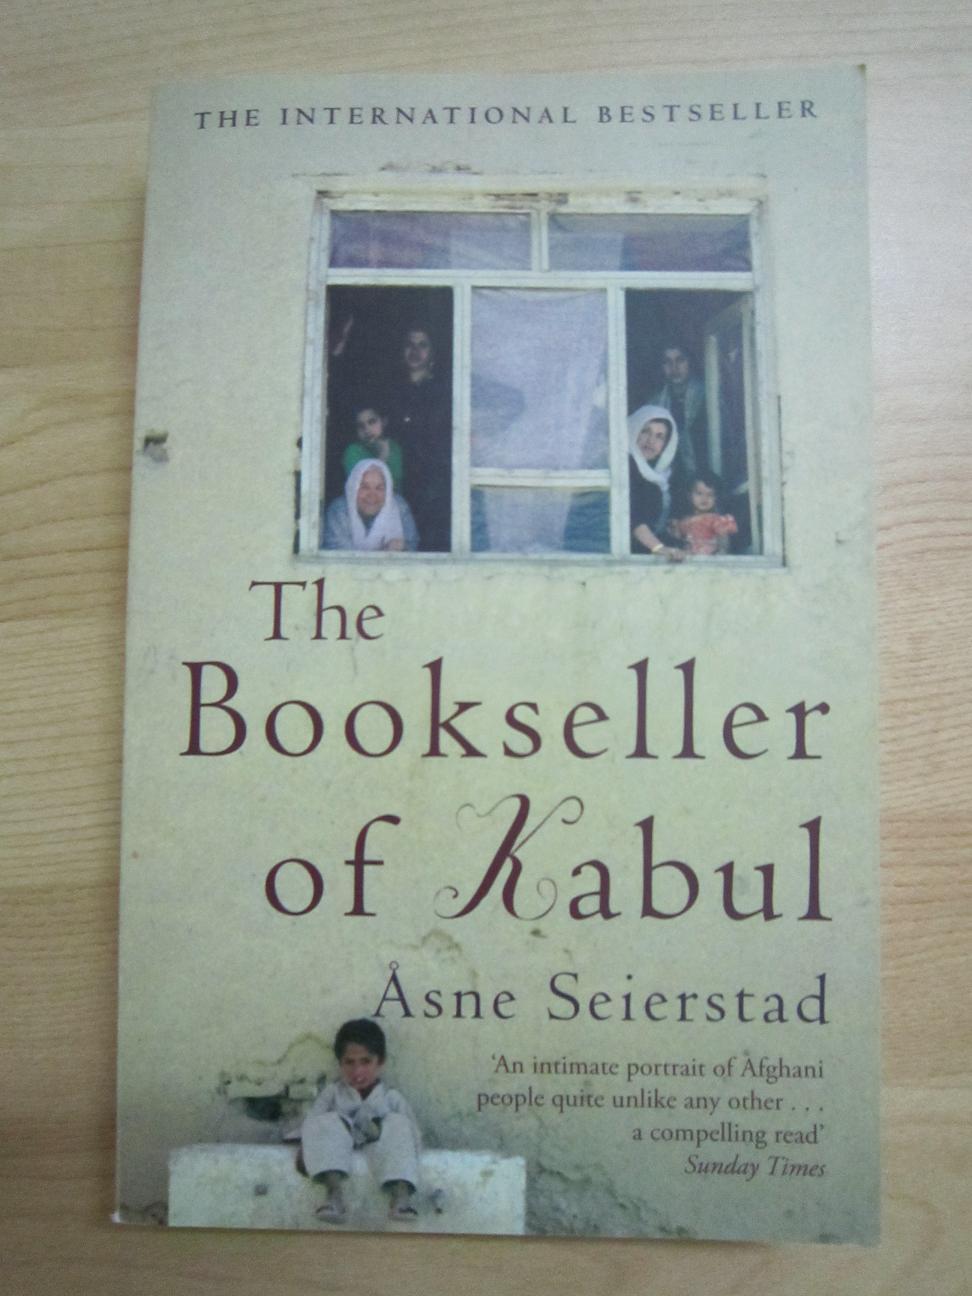 bookseller of kabul essay